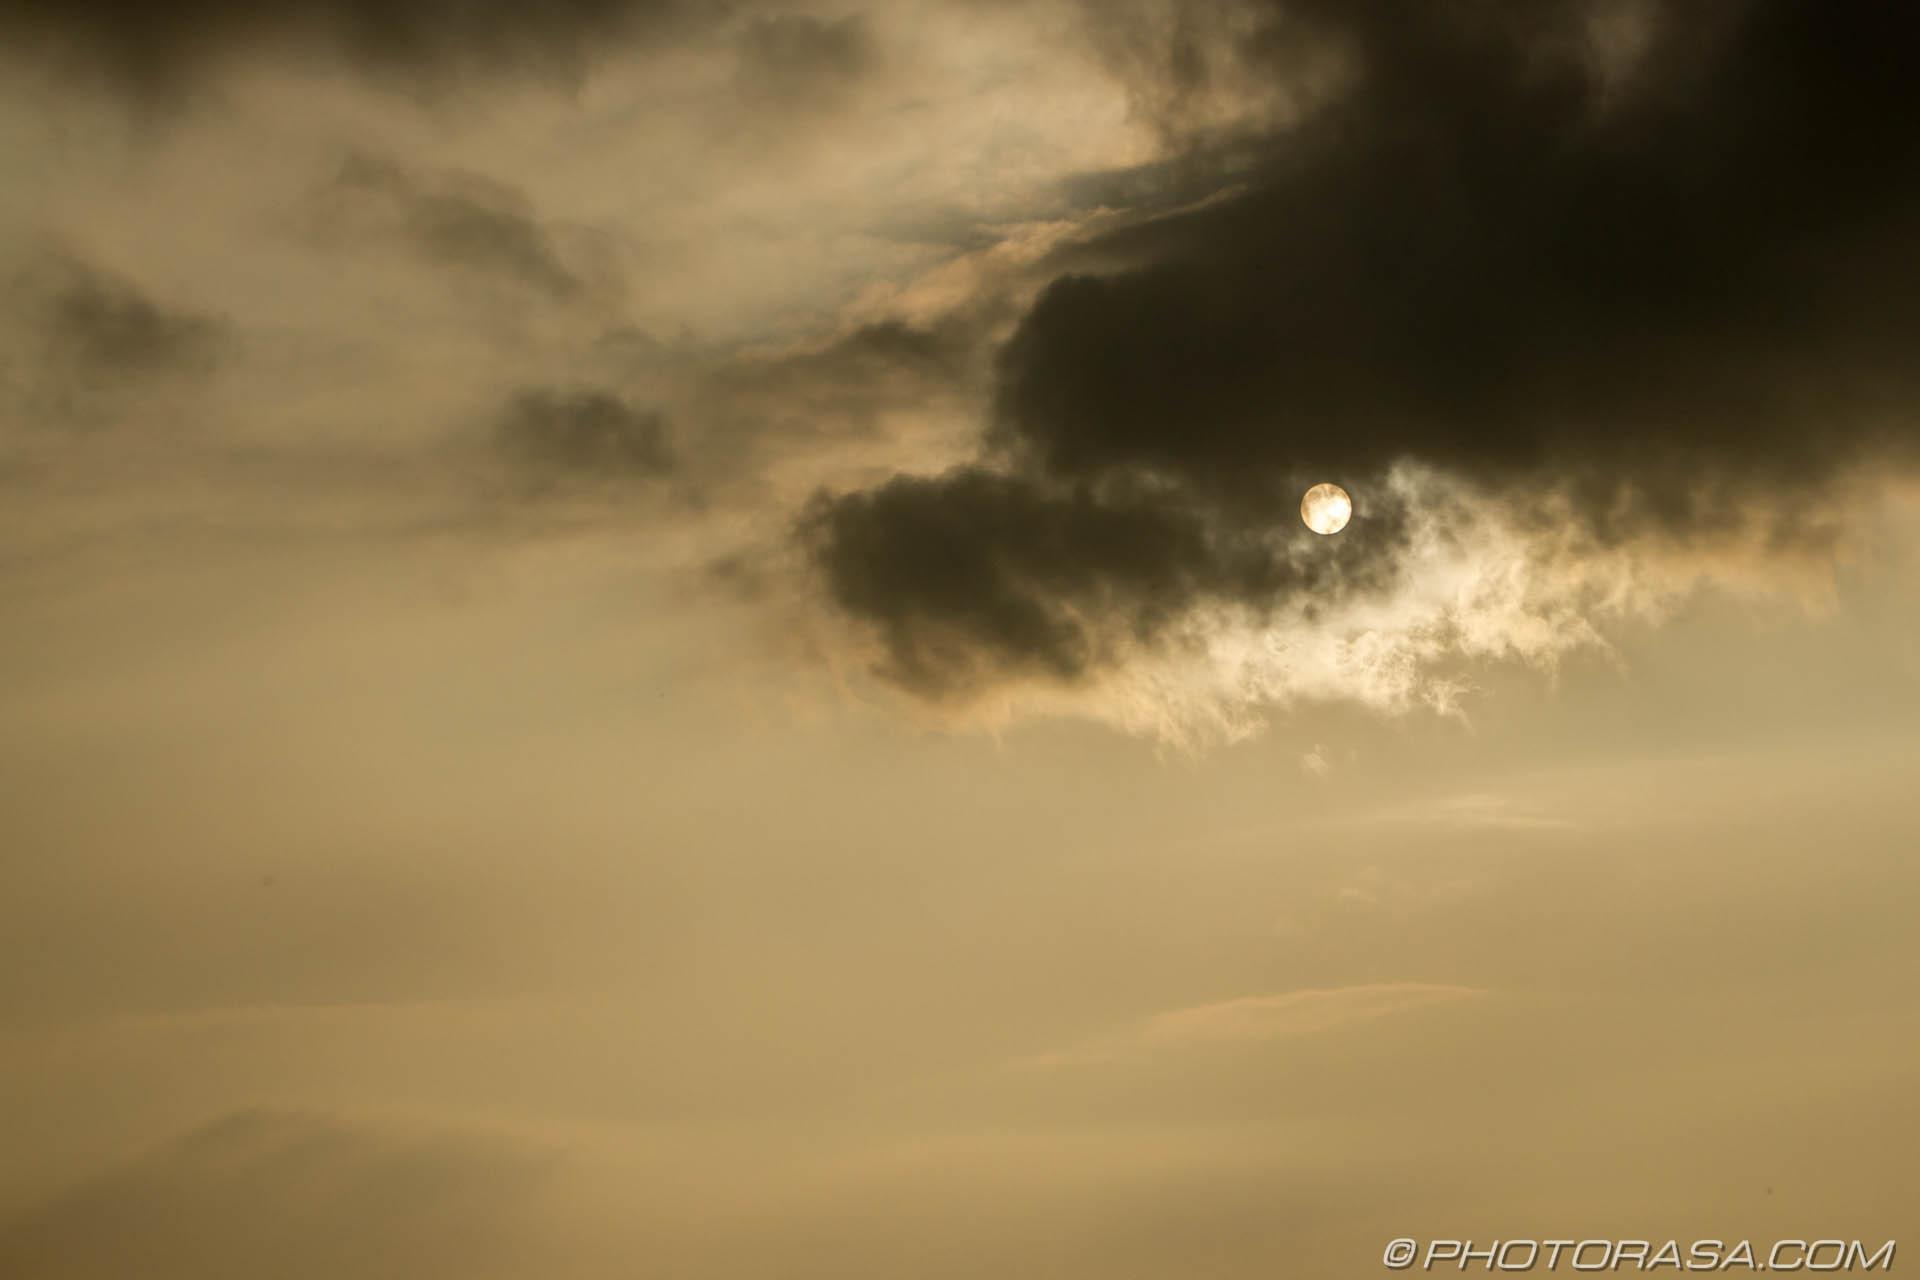 https://photorasa.com/sun-shining-through-the-clouds/sun-behind-a-dark-cloud/